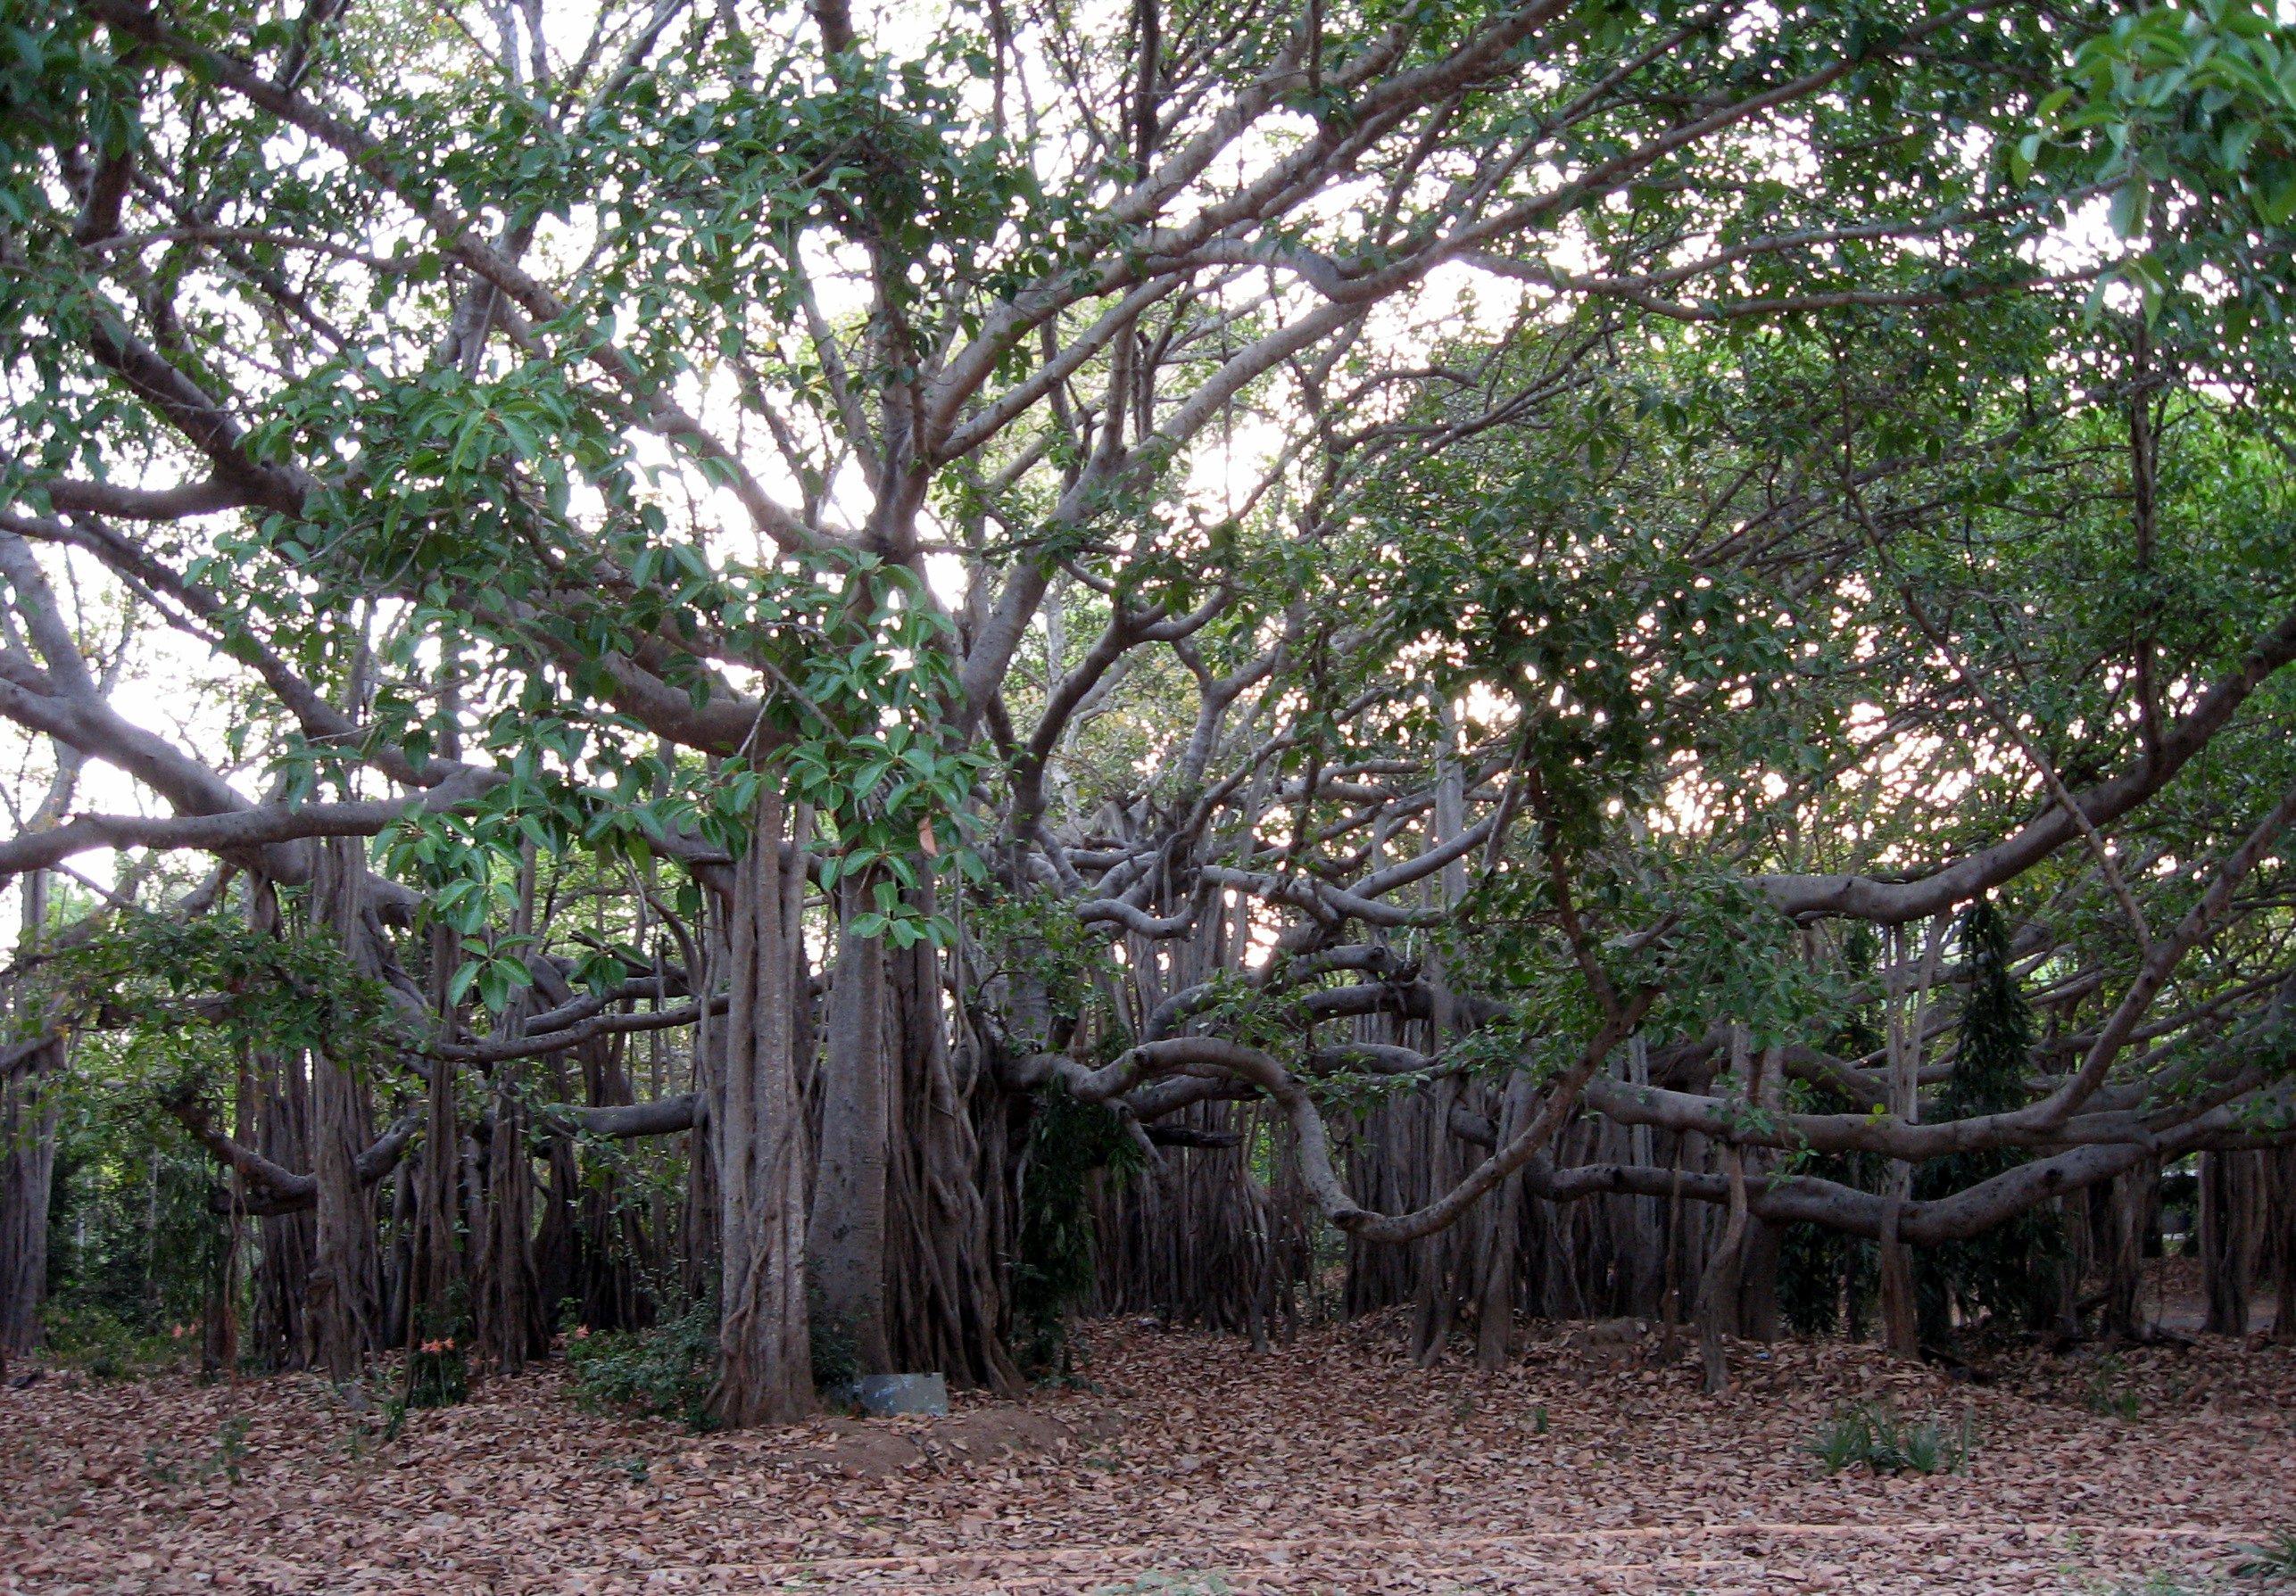 IIT Madras Wikipedia: File:Banyan Tree At IITMadras1.JPG